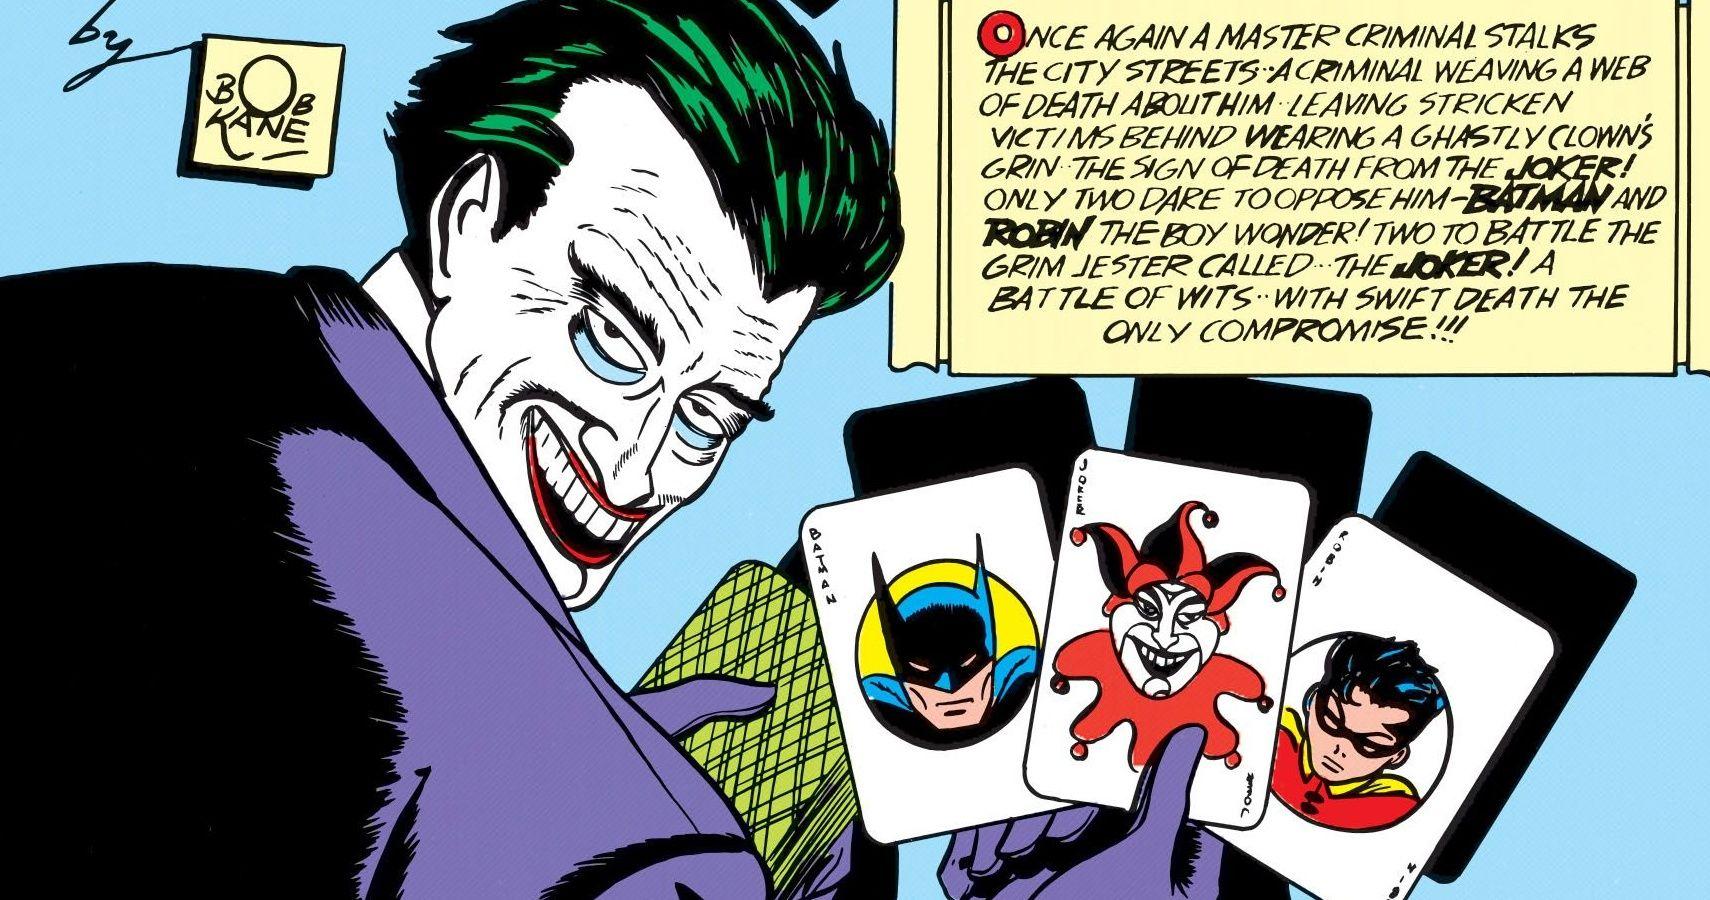 10 Different Versions Of DC Comics' Joker | CBR